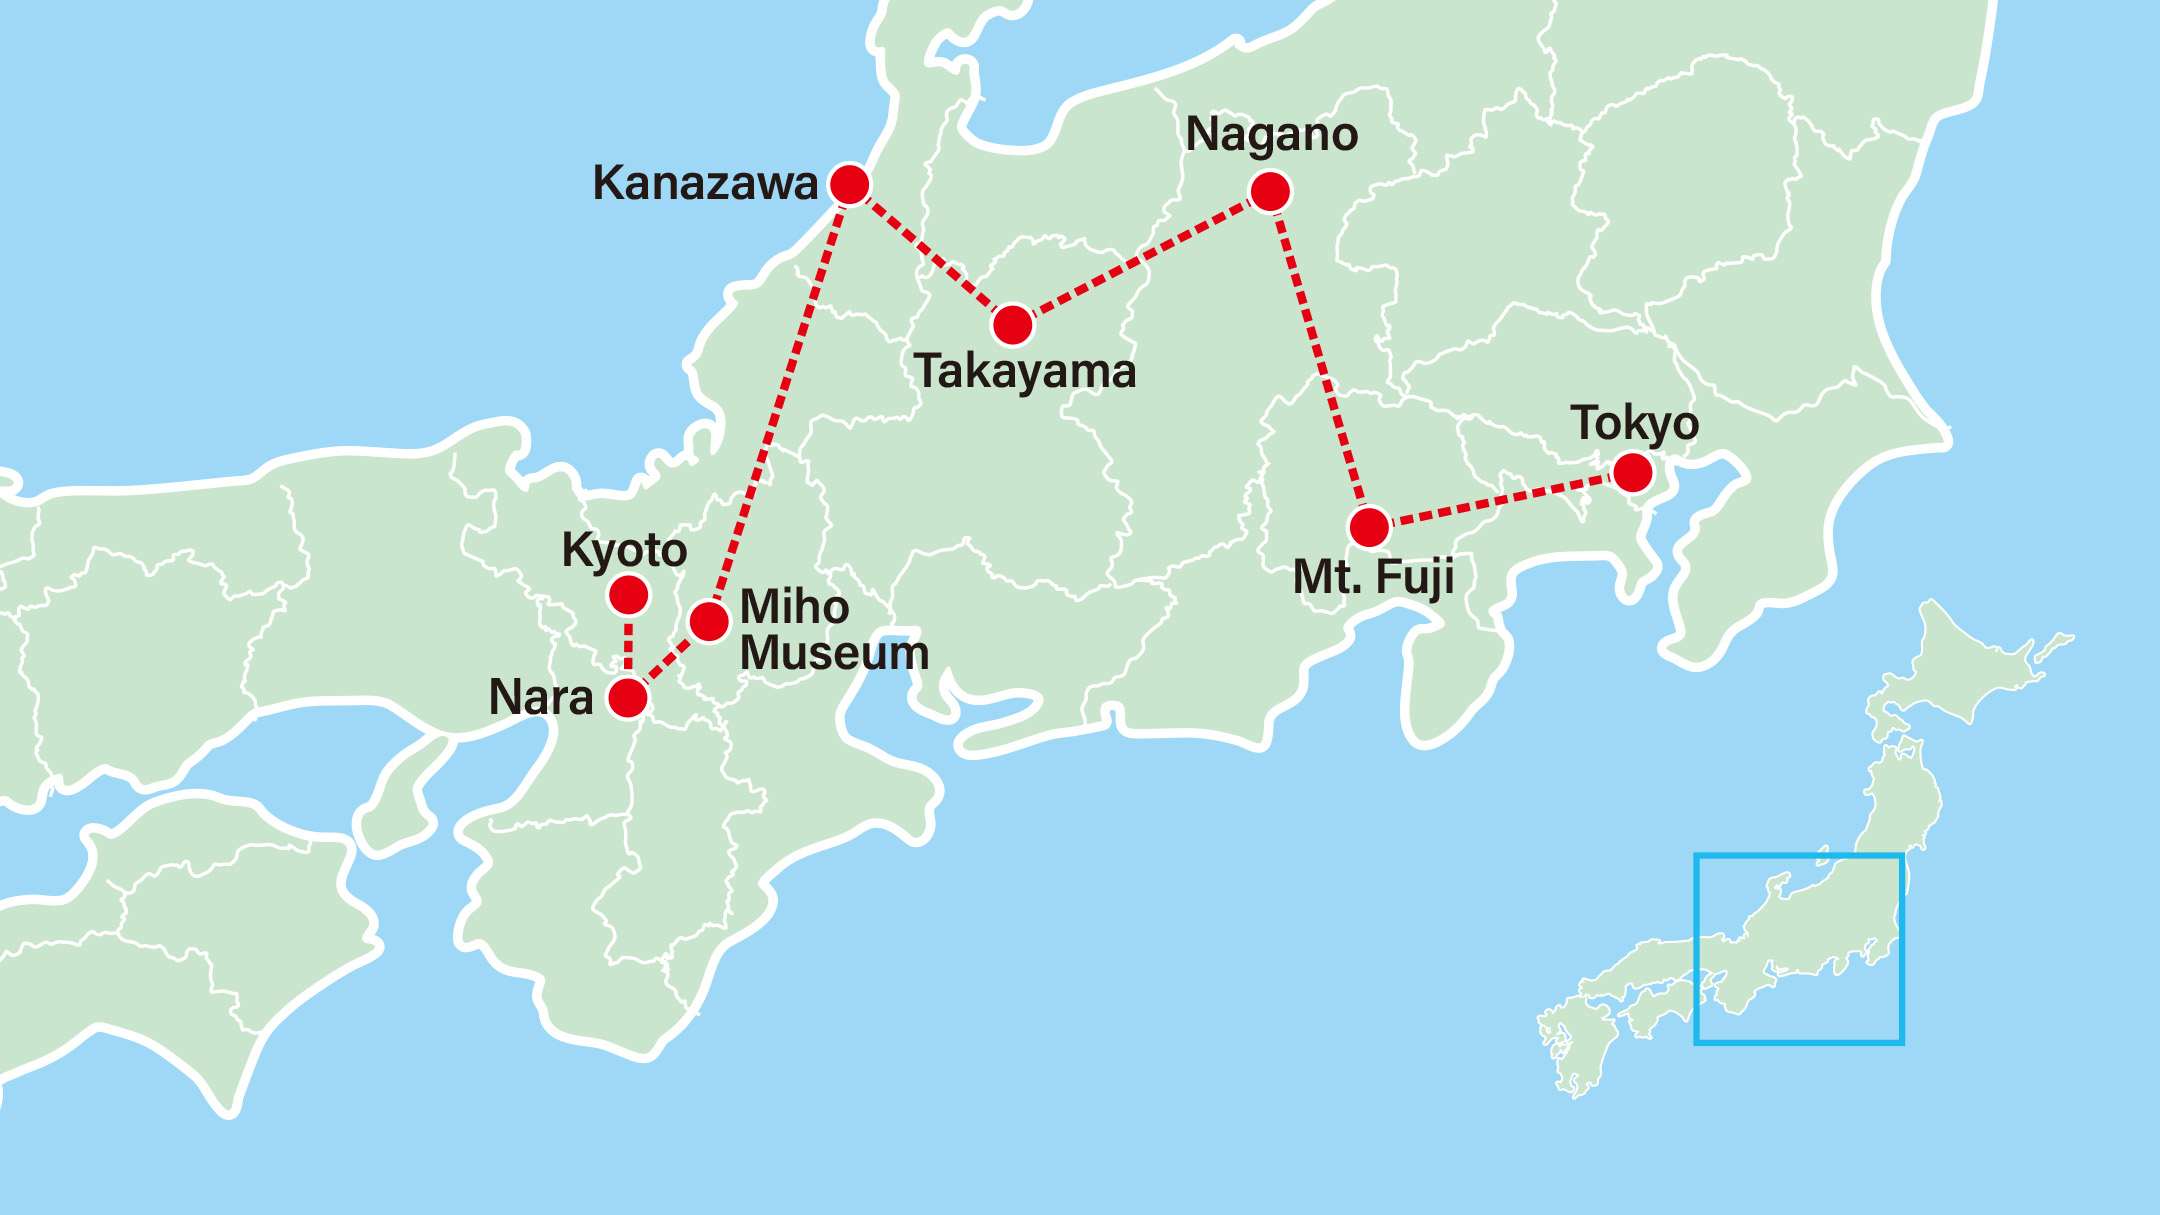 Takayama & Villages | Anime 10 Days-Tokyo-Lake Kawaguchi-Nagano-Takayama-Kanazawa-Miho Museum-Nara-Kyoto